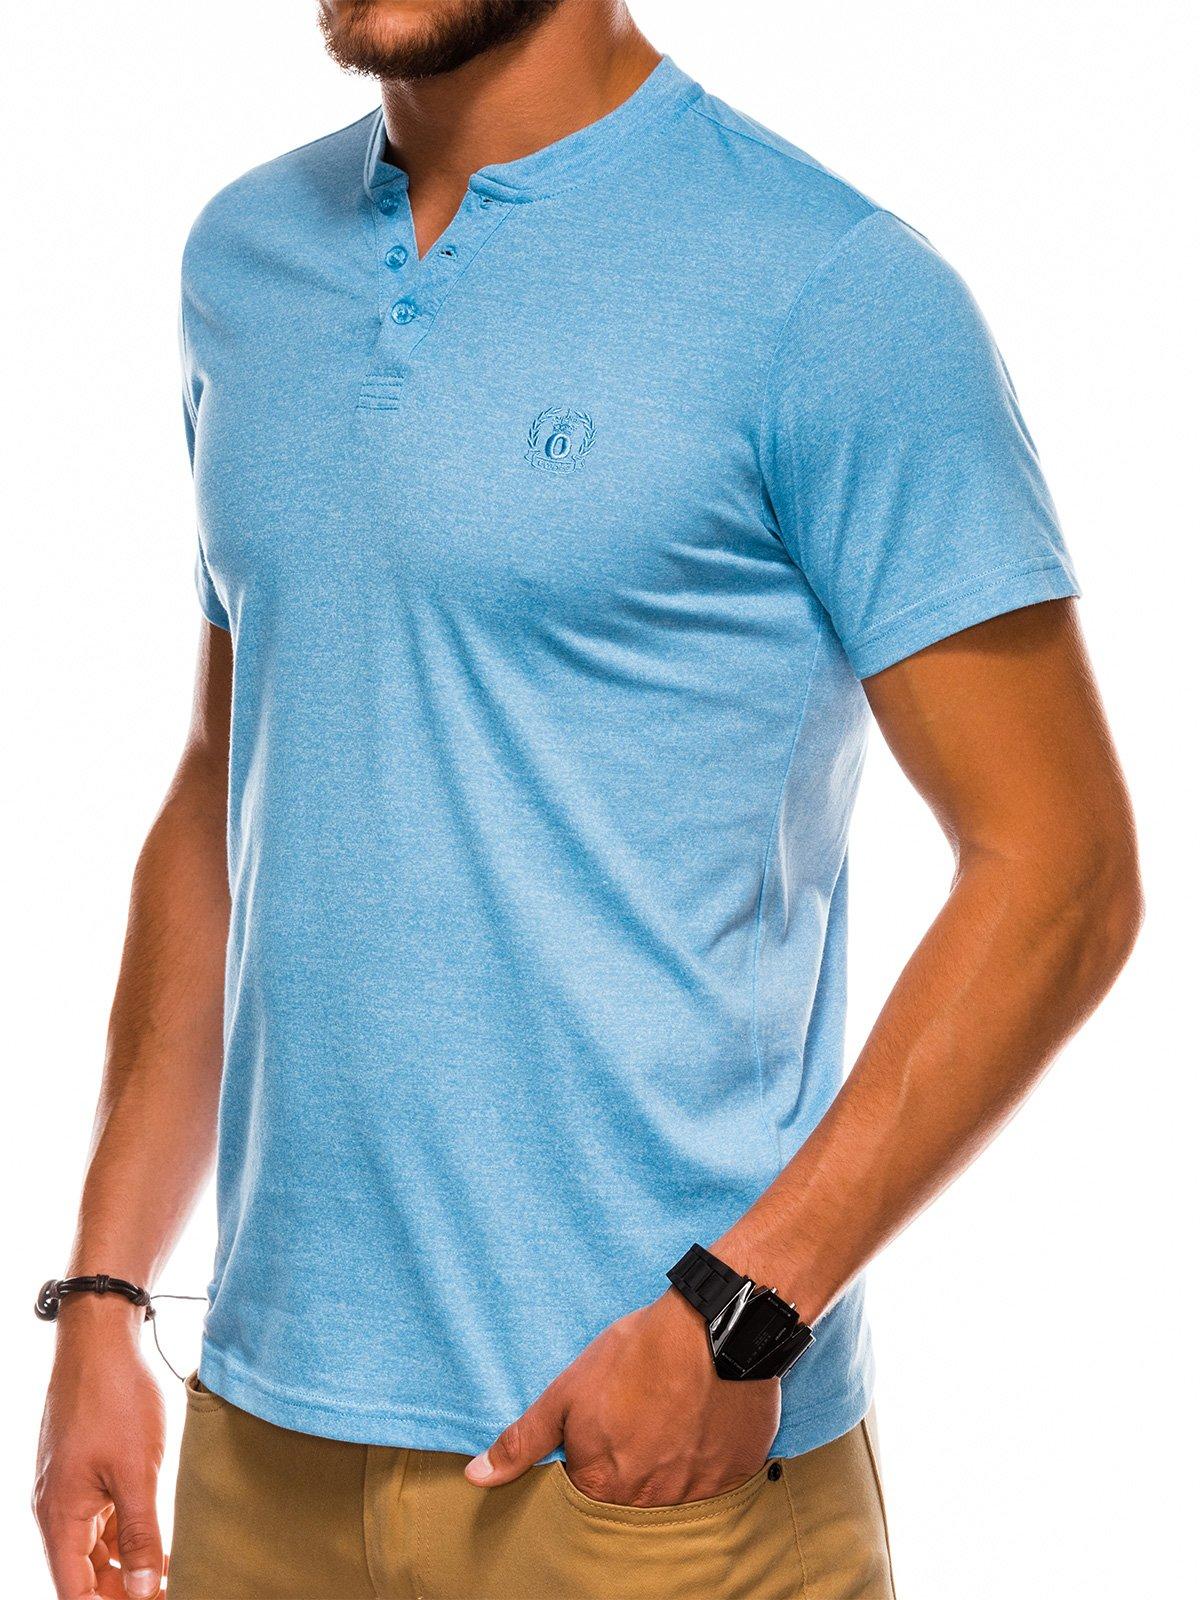 Mens plain t-shirt S1047 - light blue | MODONE wholesale